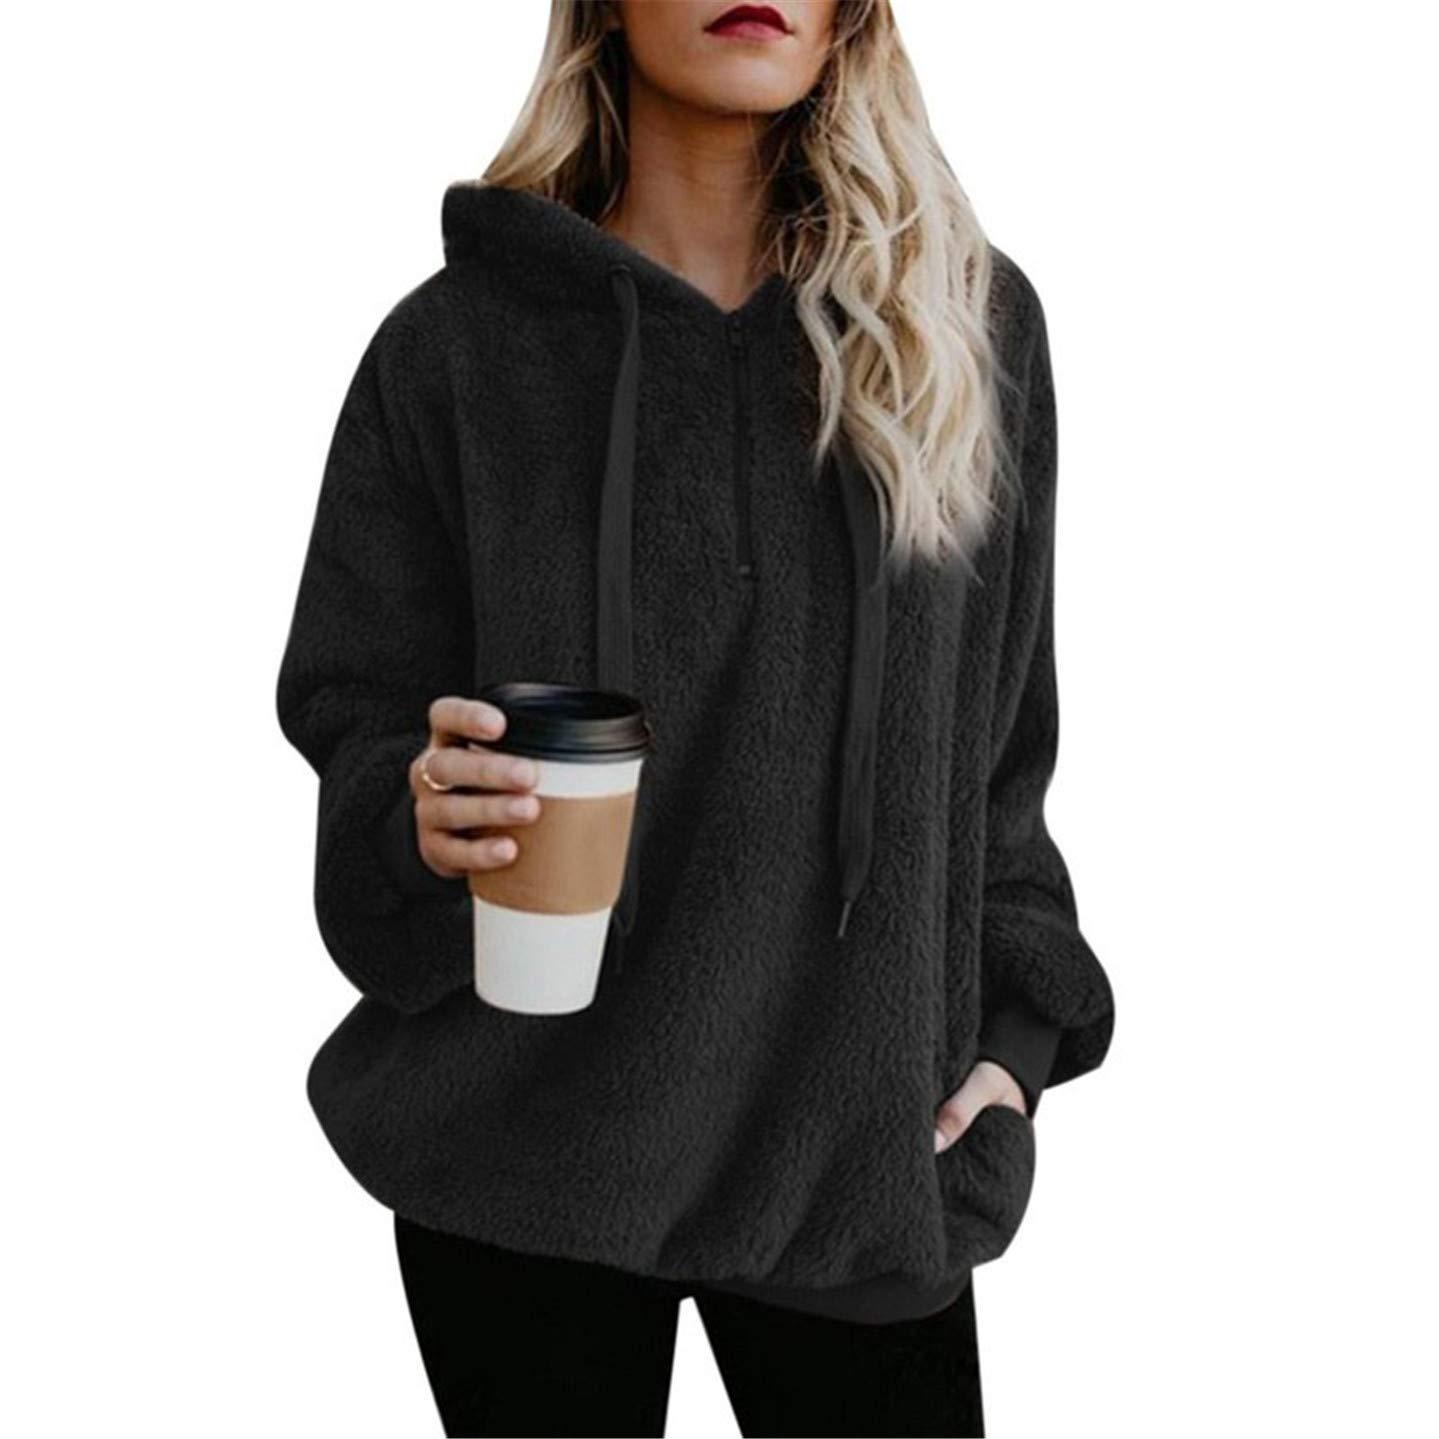 79c9367f14d Amazon.com  Yakke Pullovers Sweatshirts Female Hoodie Pink   Gray Plus Size  Sweatshirt Hoodies Women Long Sleeves Hoody for Wome  Clothing